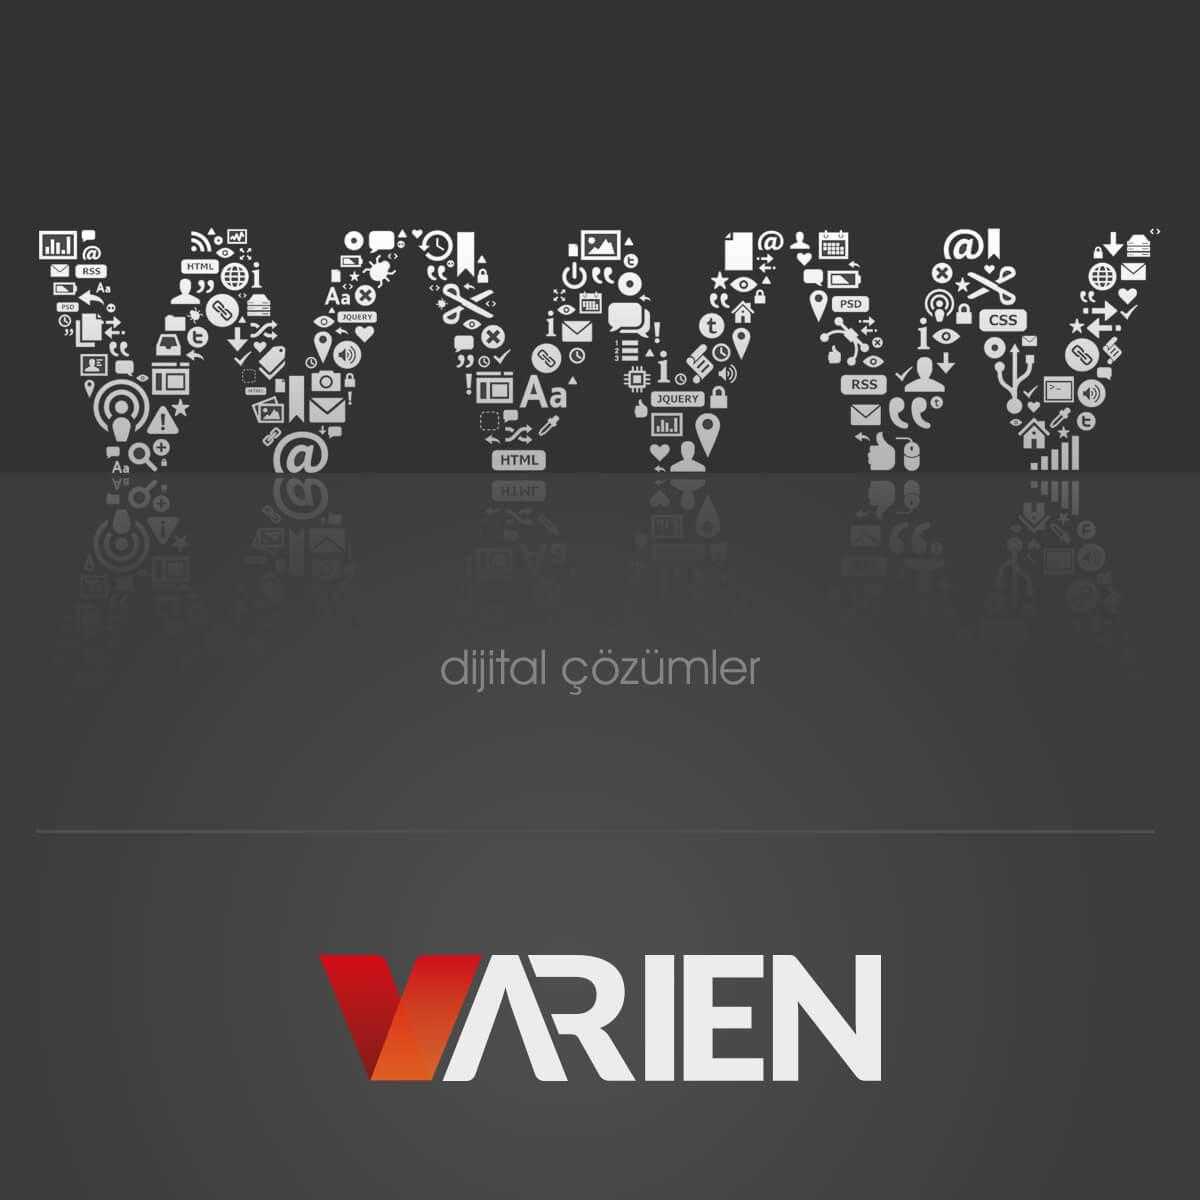 varien web tasarım